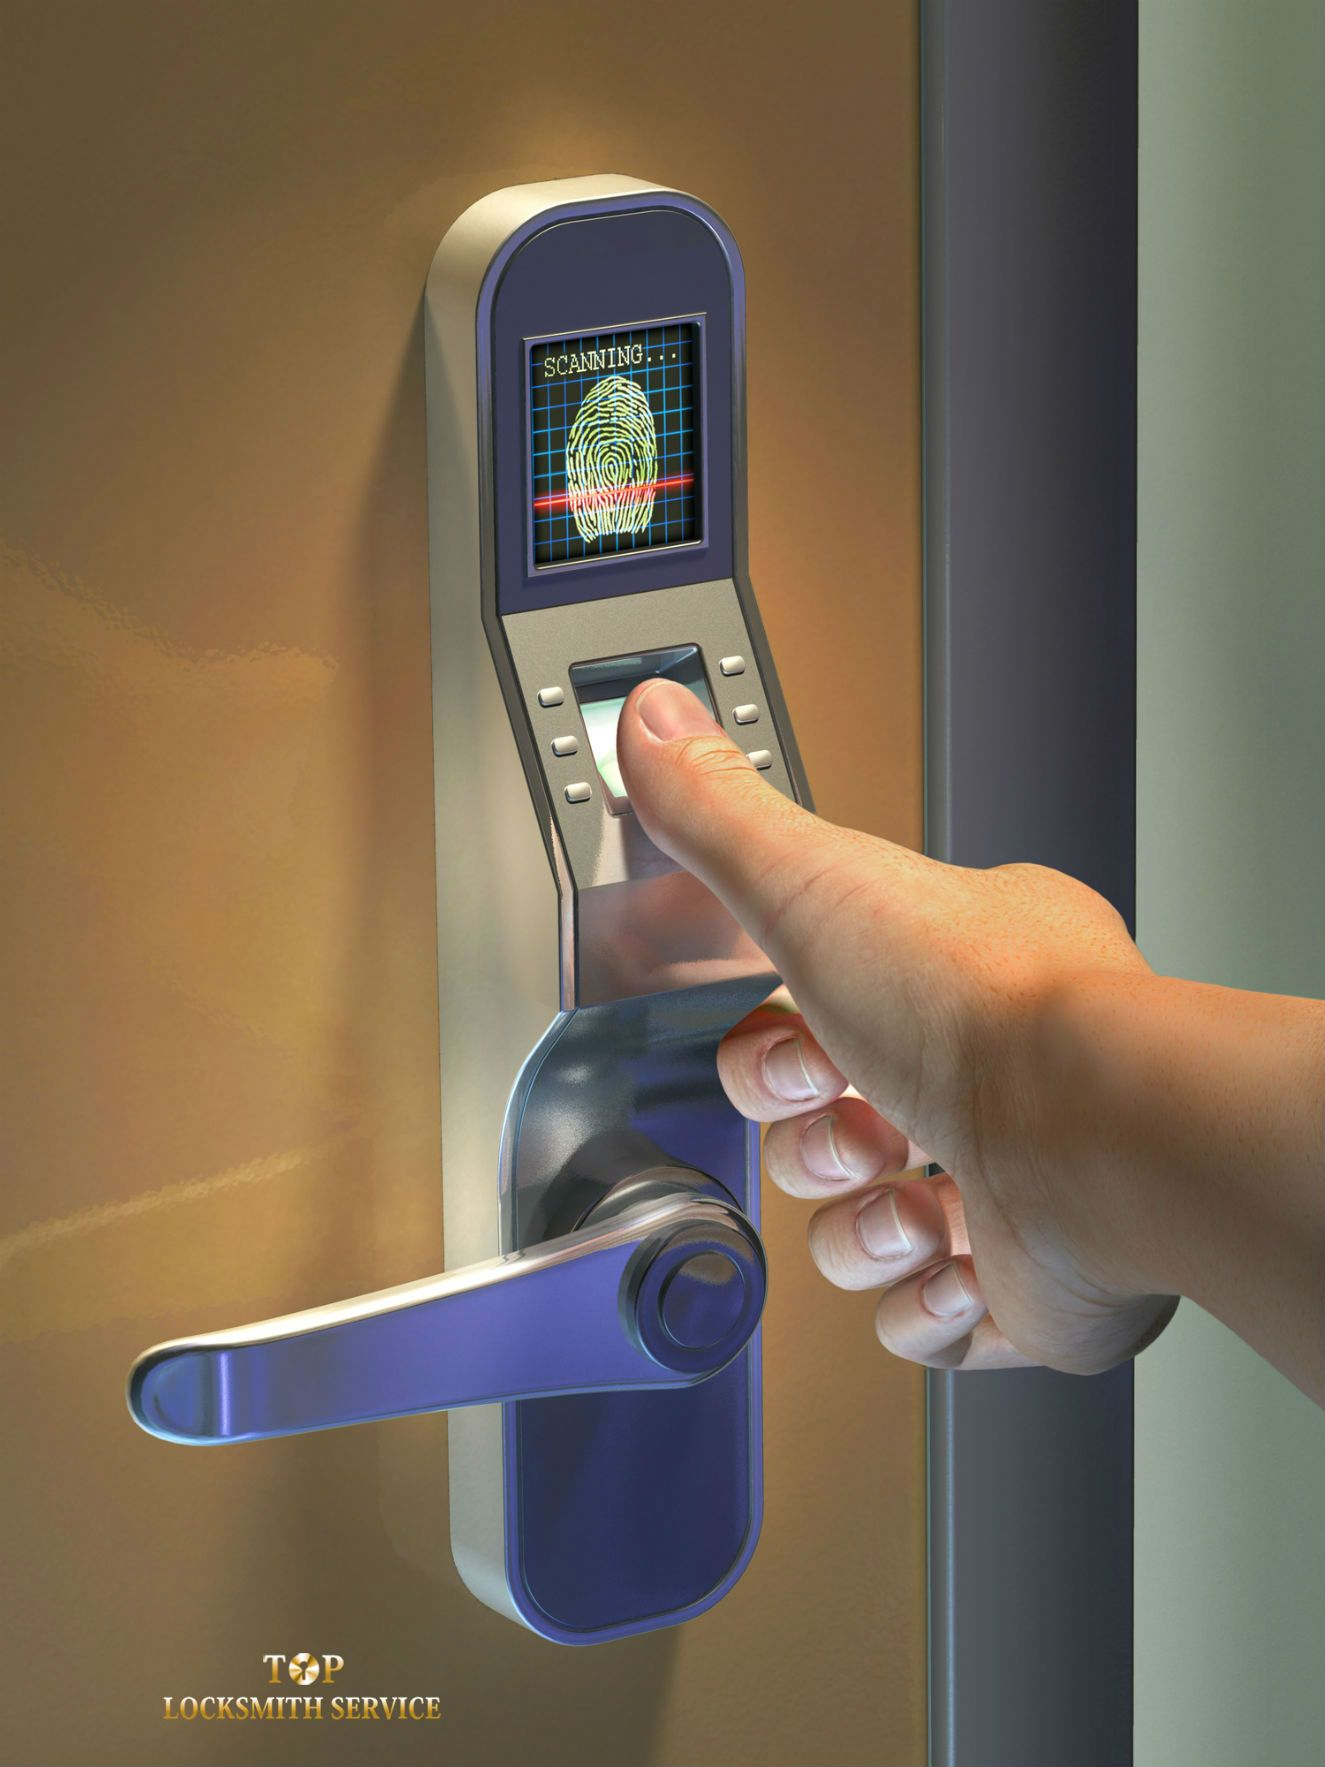 Biometrics for Access Control enhances building security